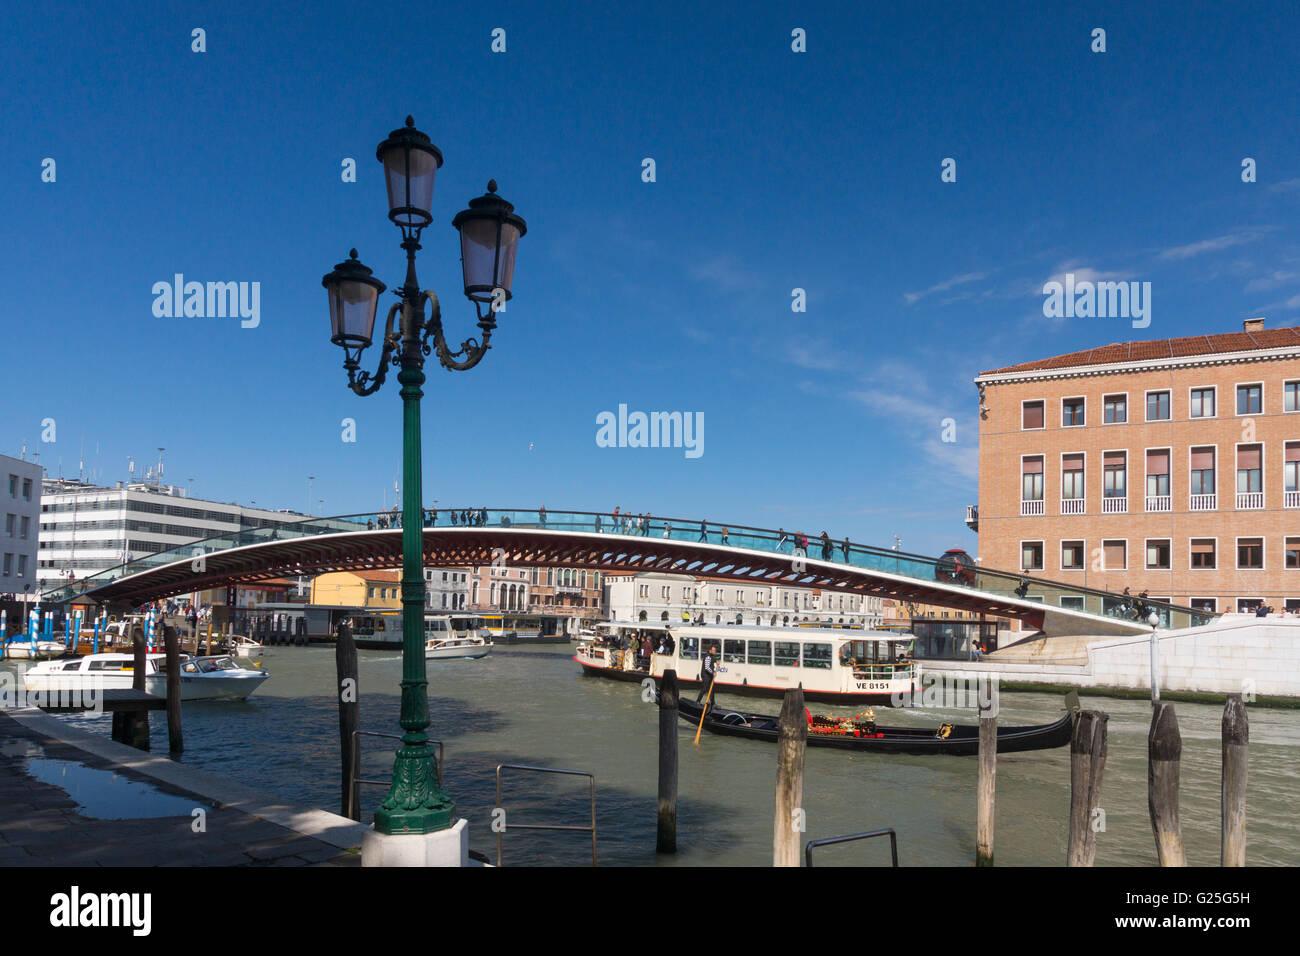 A gondoler passes in front of Constitution Bridge, Venice - Stock Image